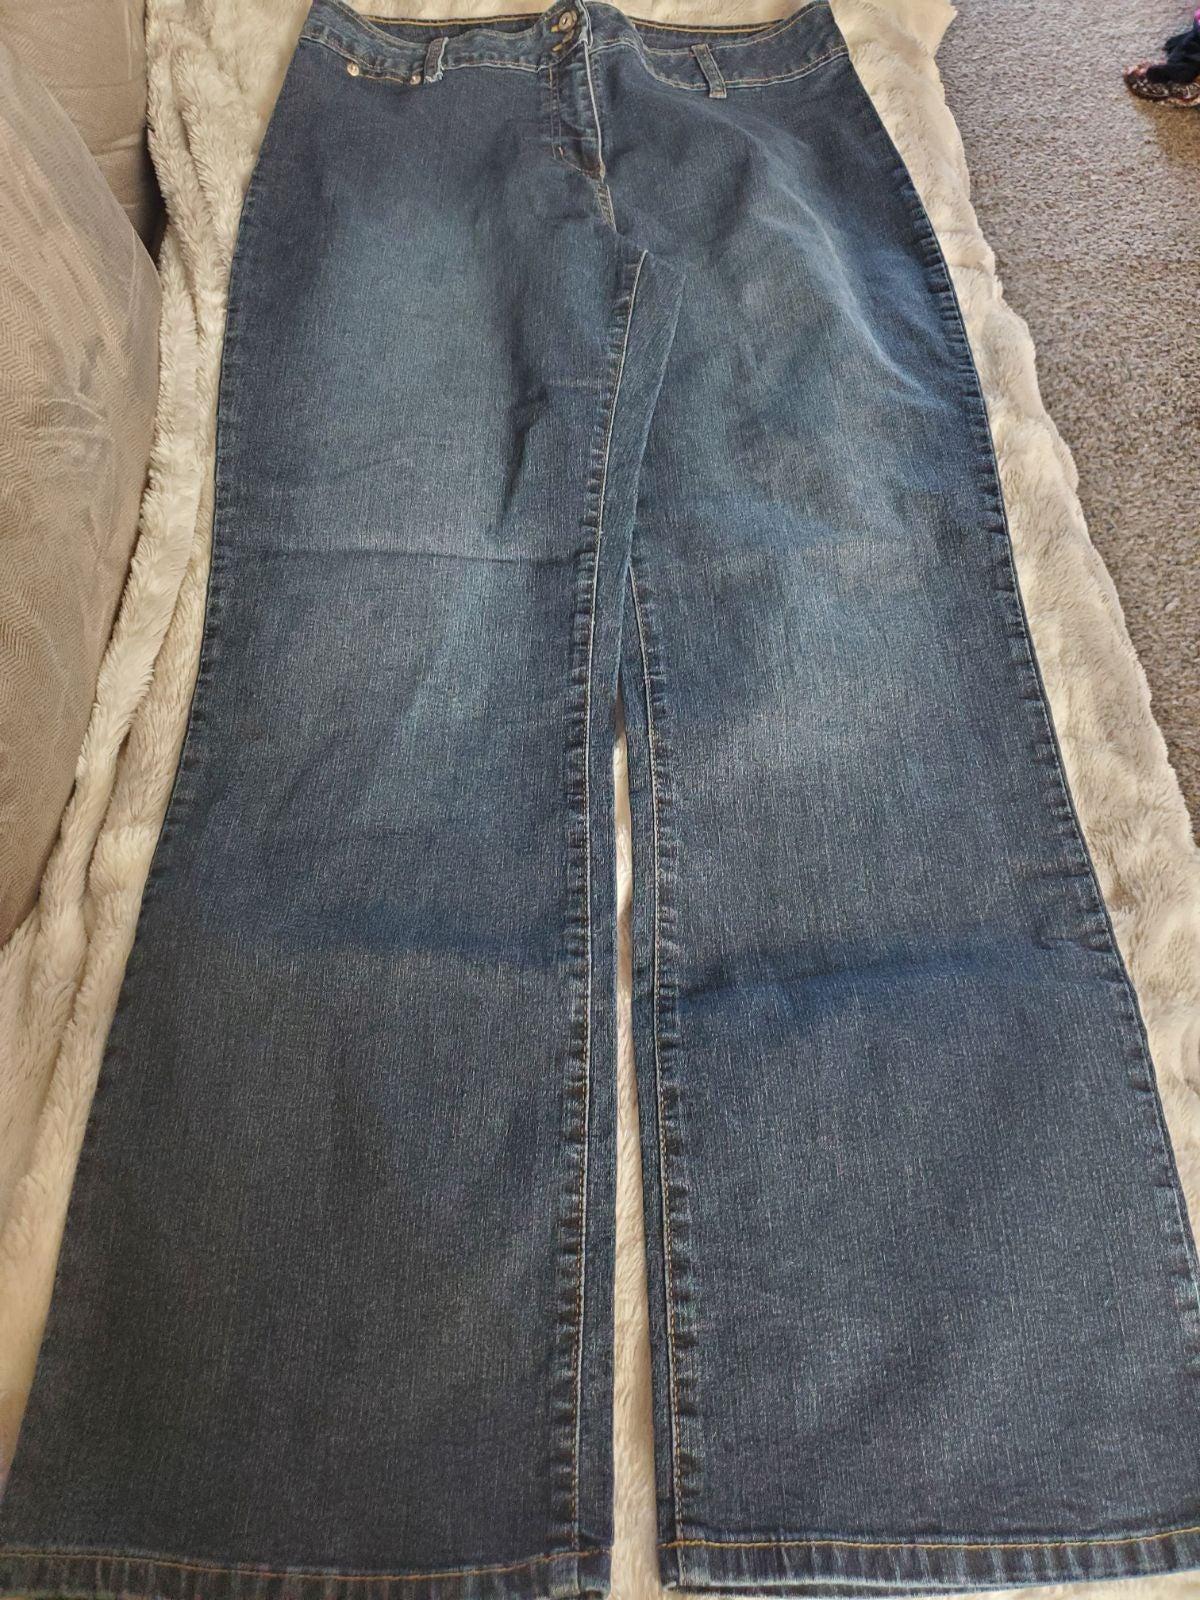 Womens size 14 carolina blues Jeans